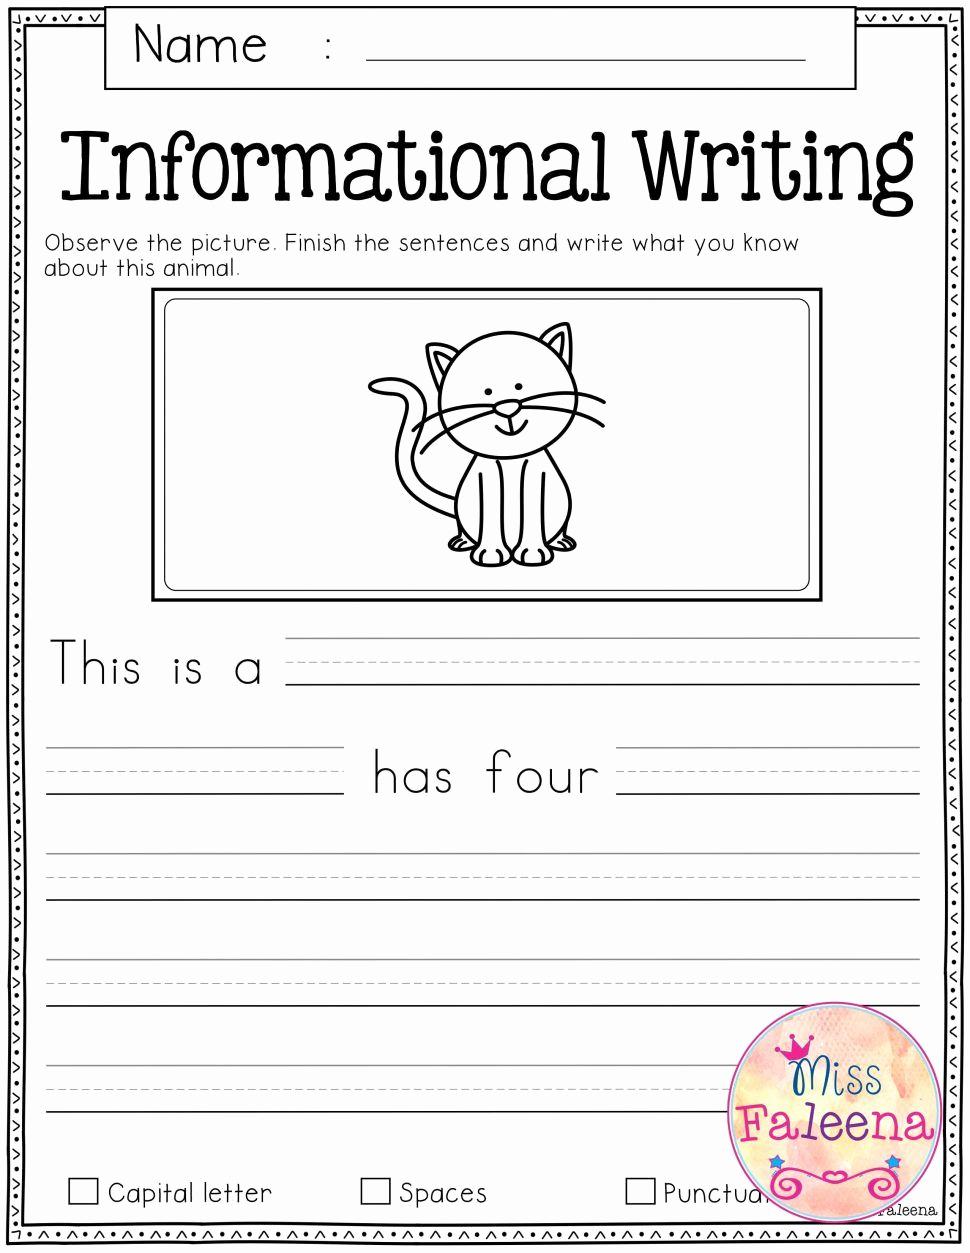 Writing Worksheet 1st Grade Fresh Printable Writing Worksheets for 1st Grade